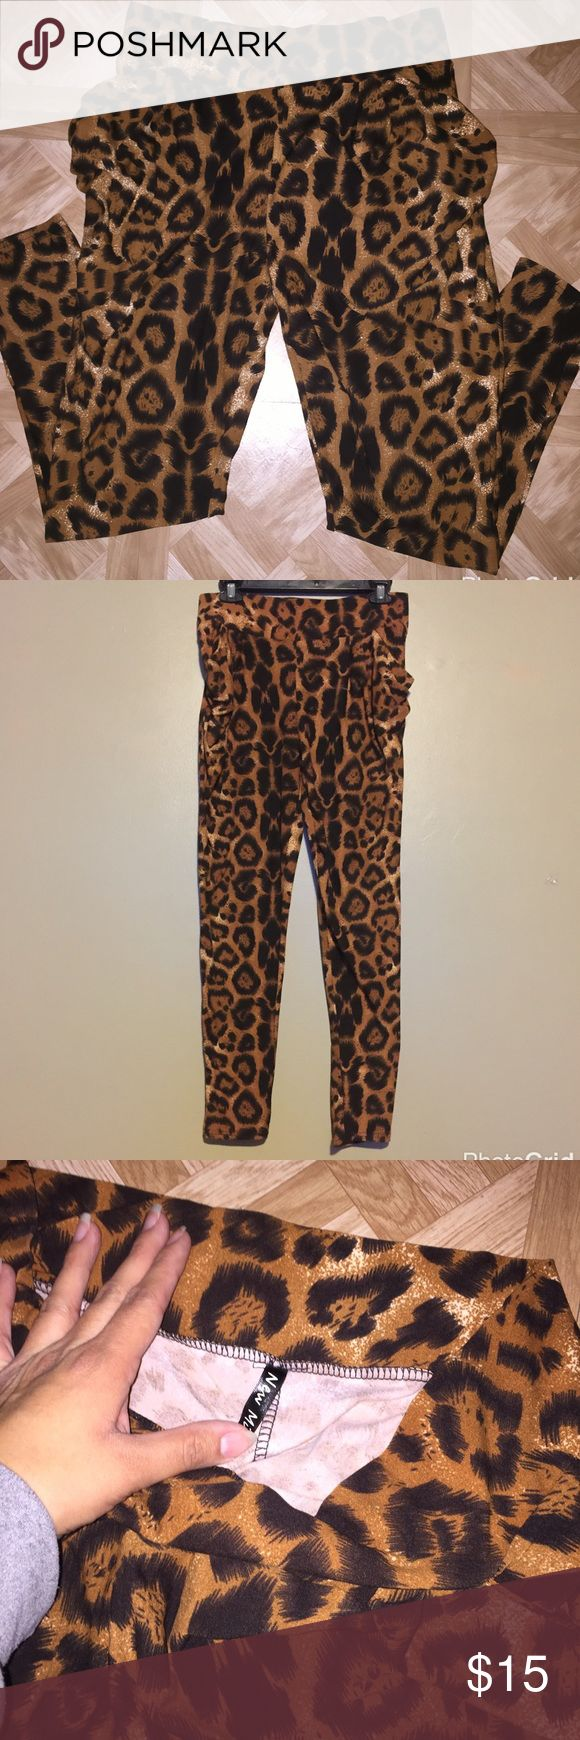 Leopard print pants Loose leopard print pants with pockets. Stretchy waist band. Never worn, size medium Pants Leggings